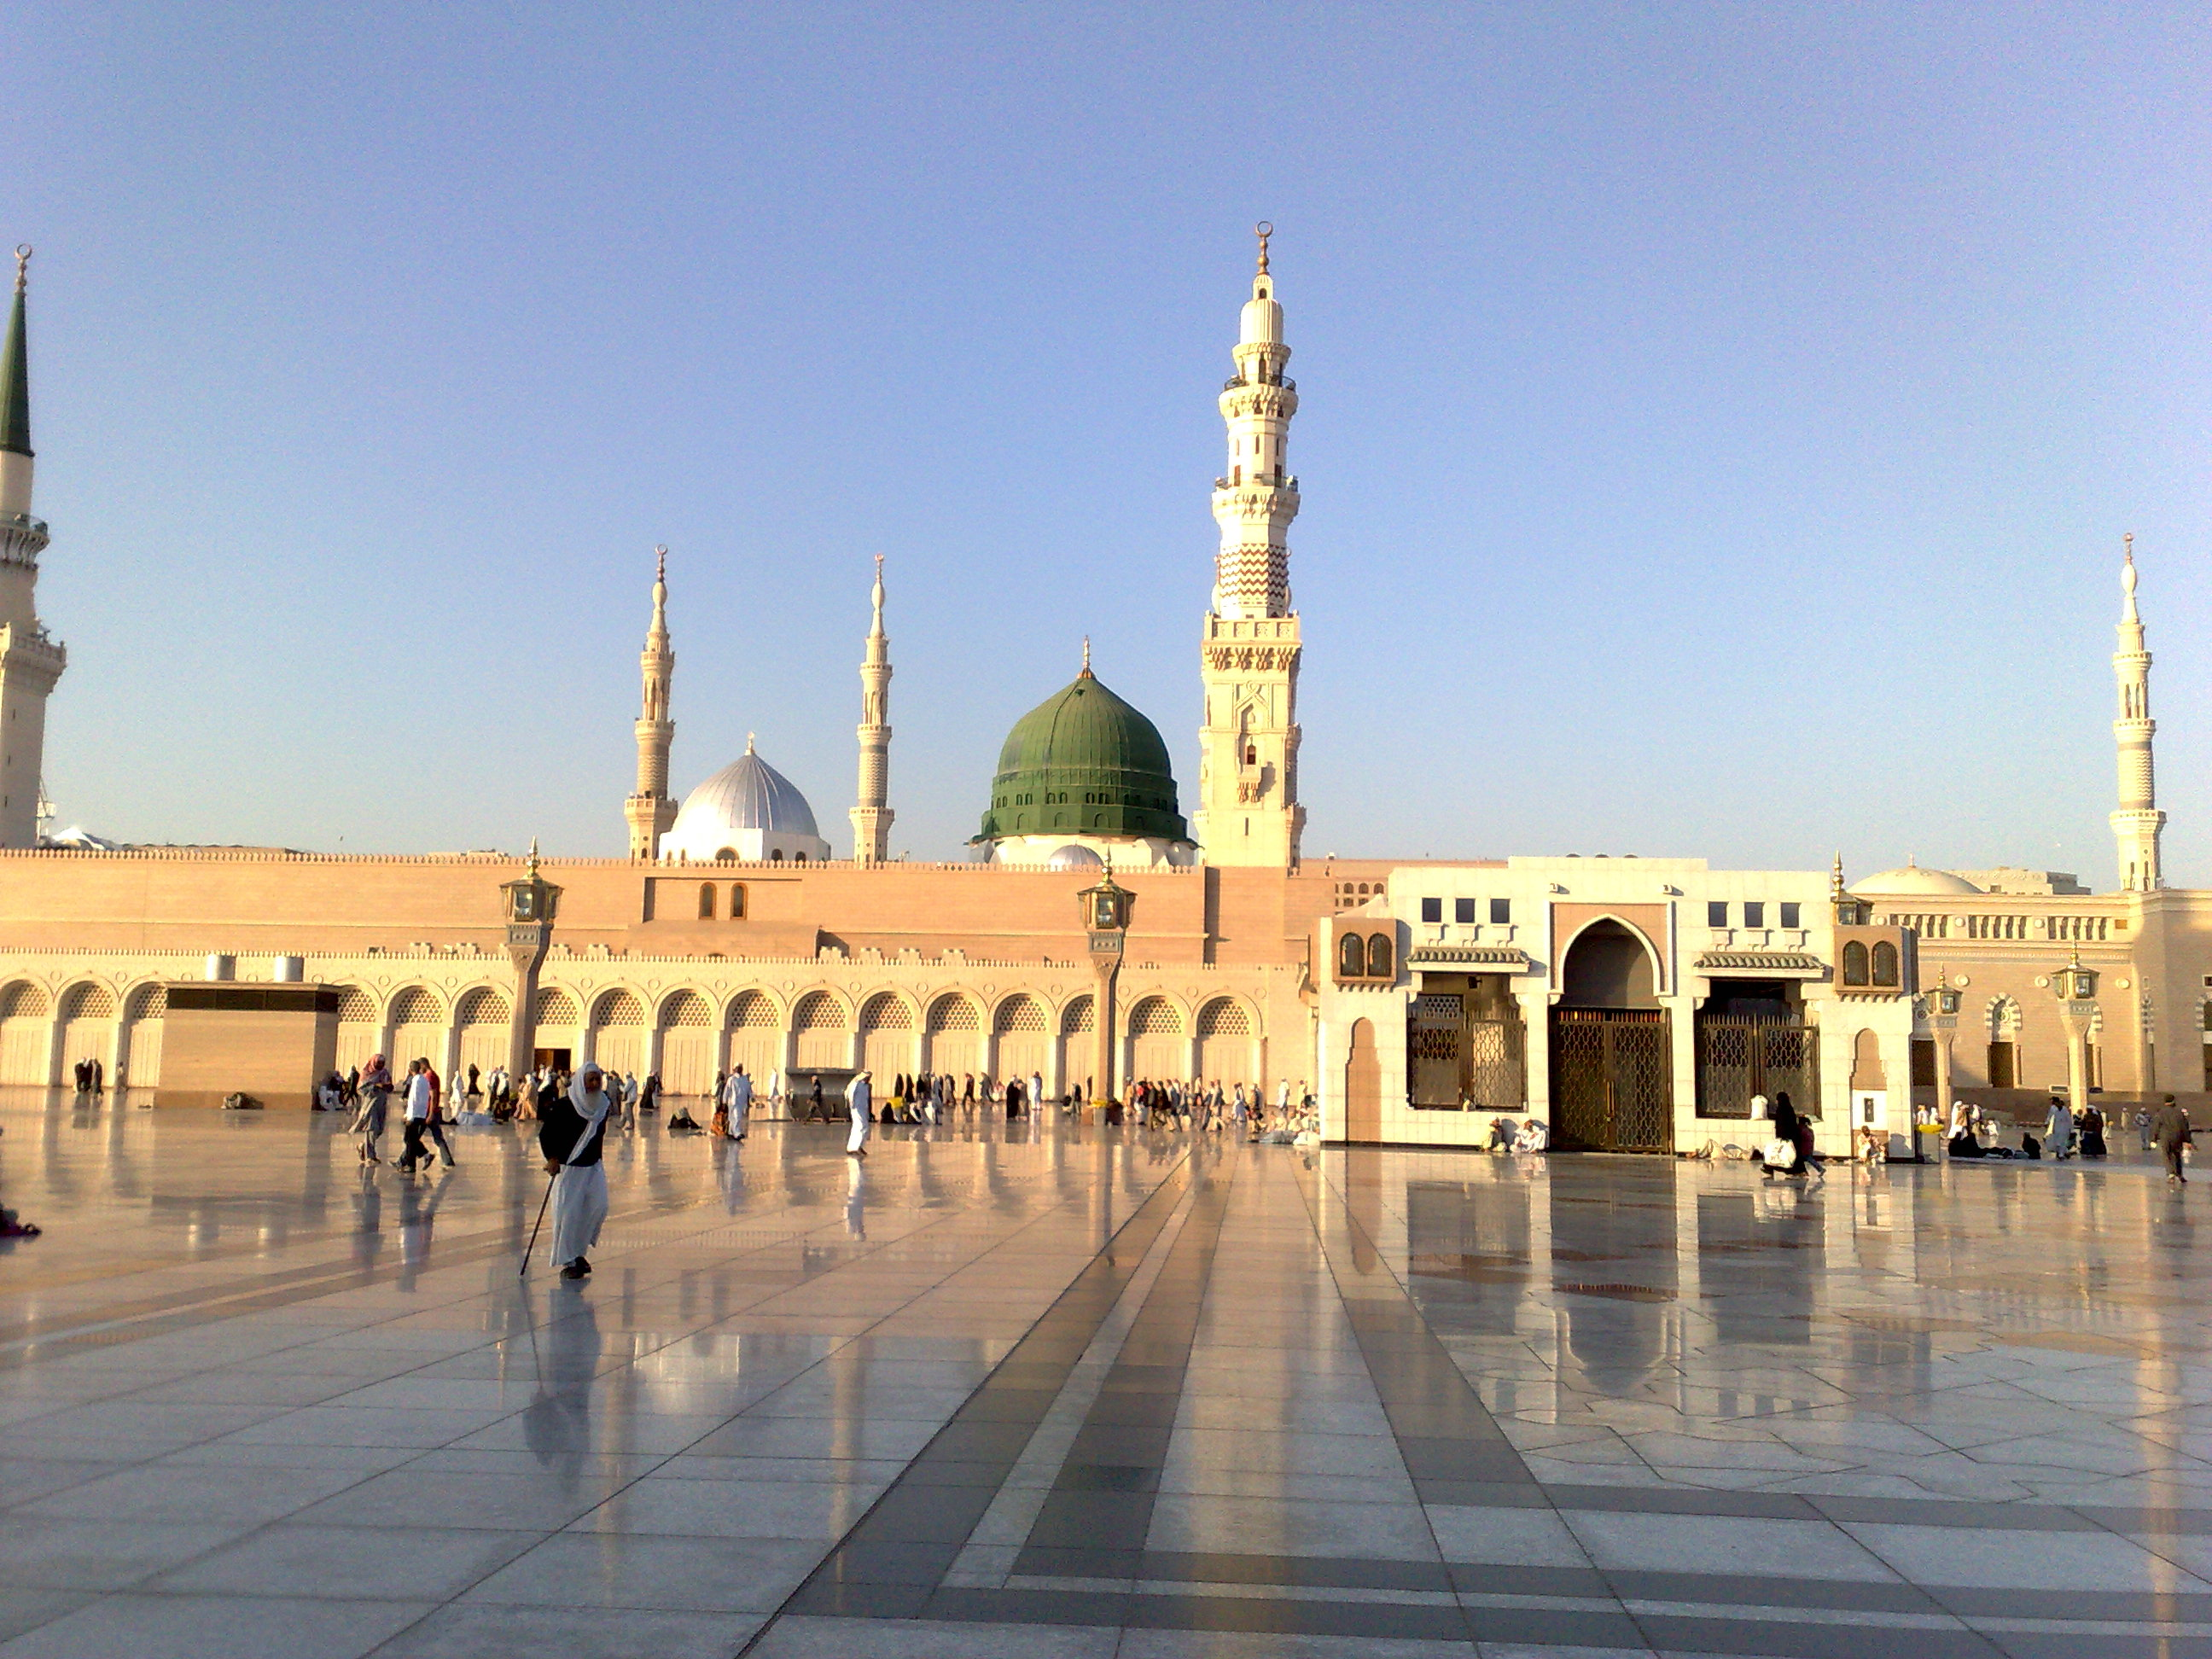 File:Madeena masjid nabavi 12122008227.jpg - Wikimedia Commons